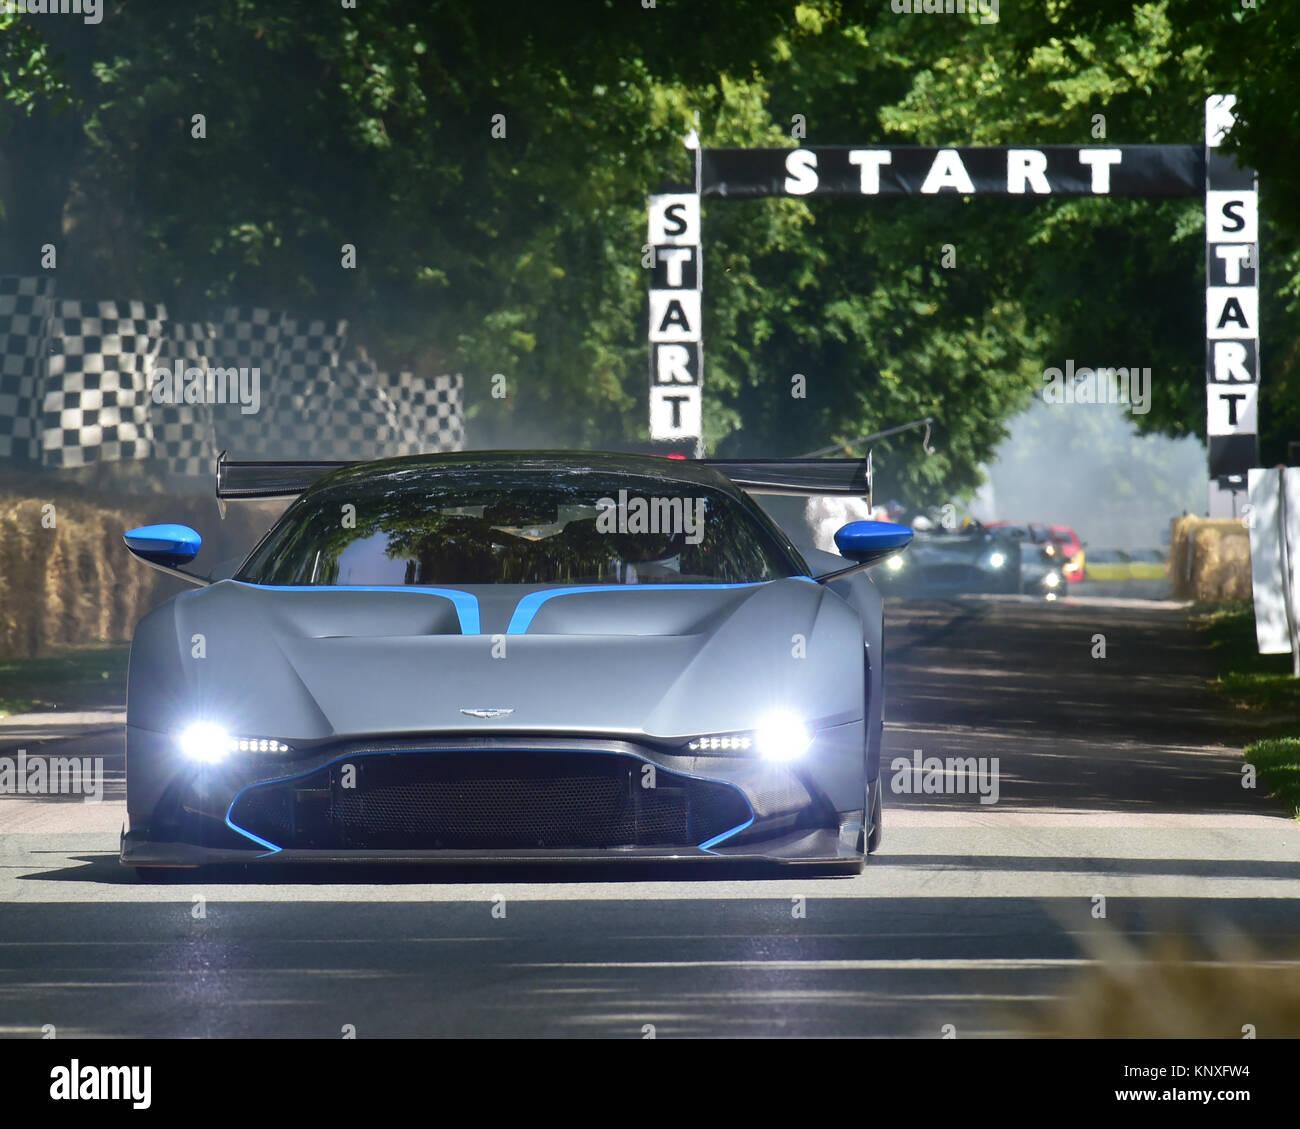 Darren Turner, Aston Martin Vulcan, Goodwood FoS 2015, 2015, Aston Martin, Aston Martin Vulcan, Classic, Darren - Stock Image